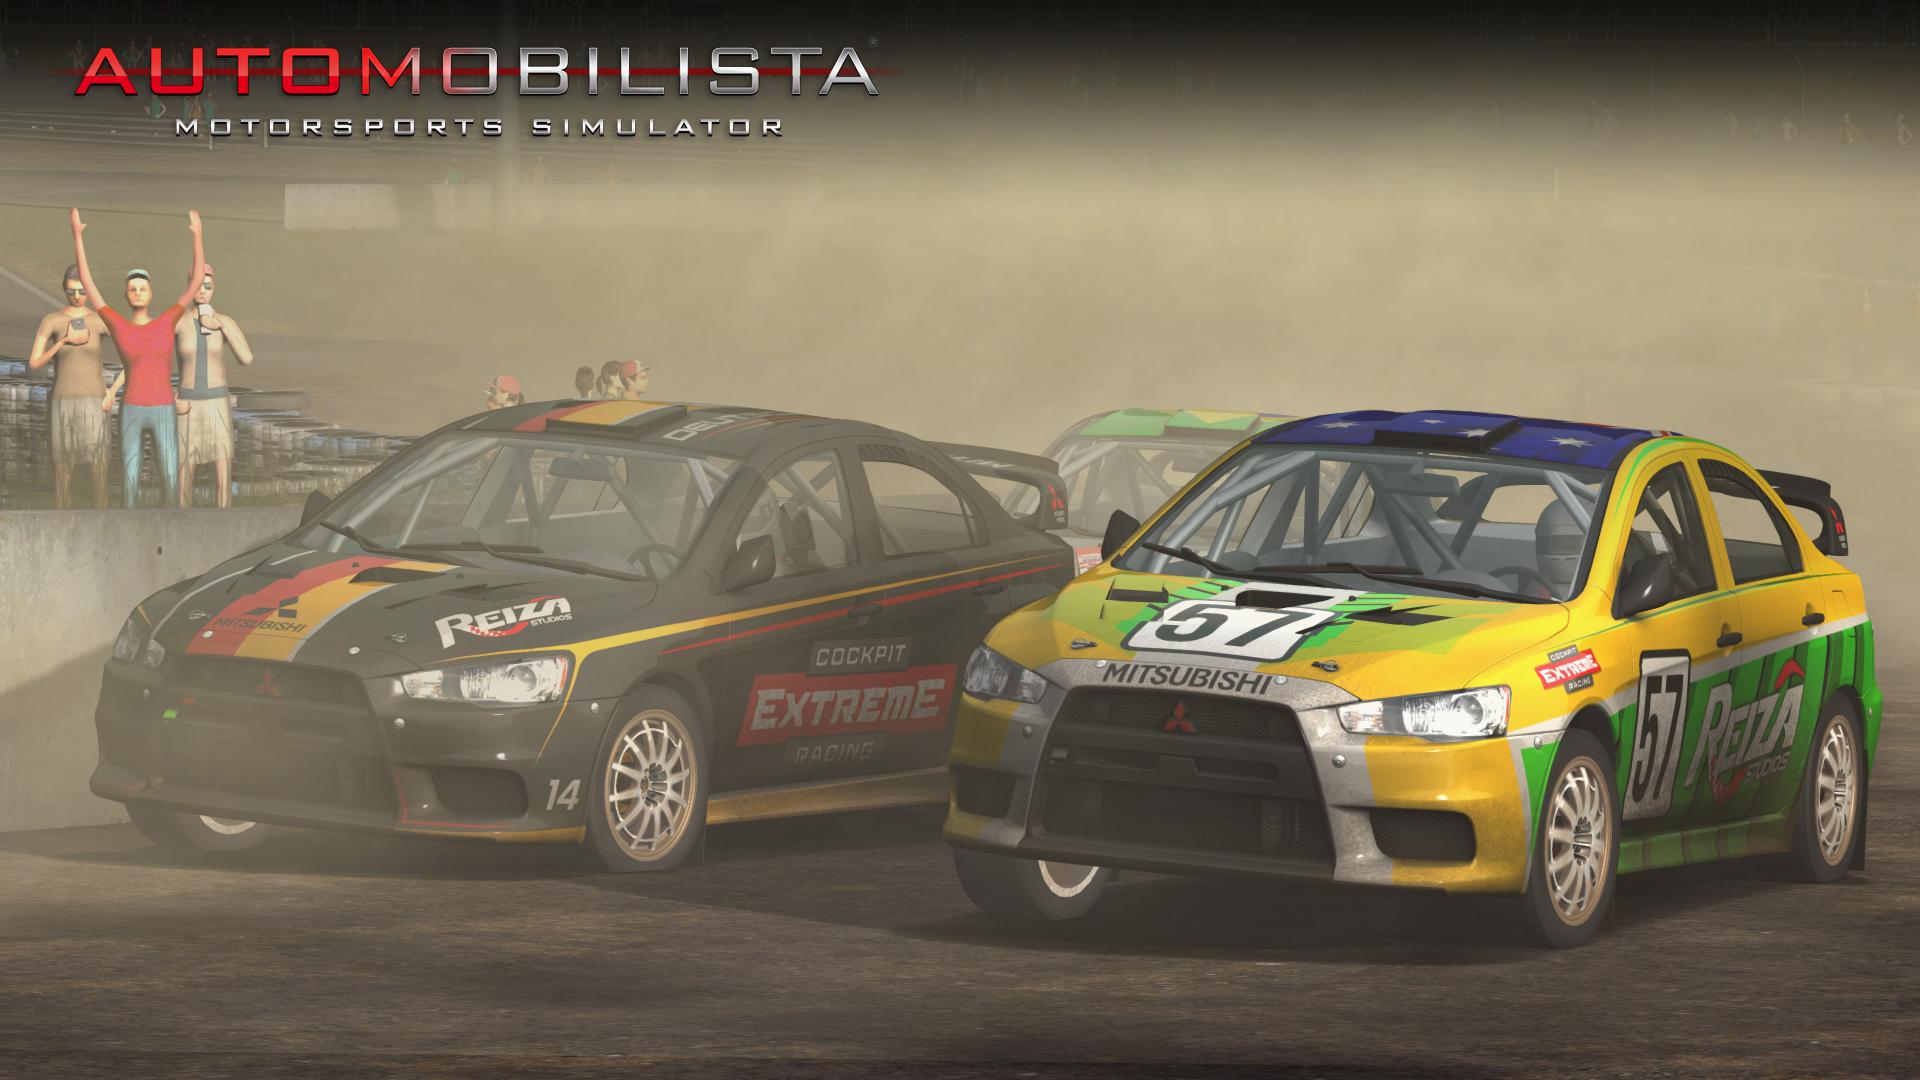 Automobilista Screenshot 2